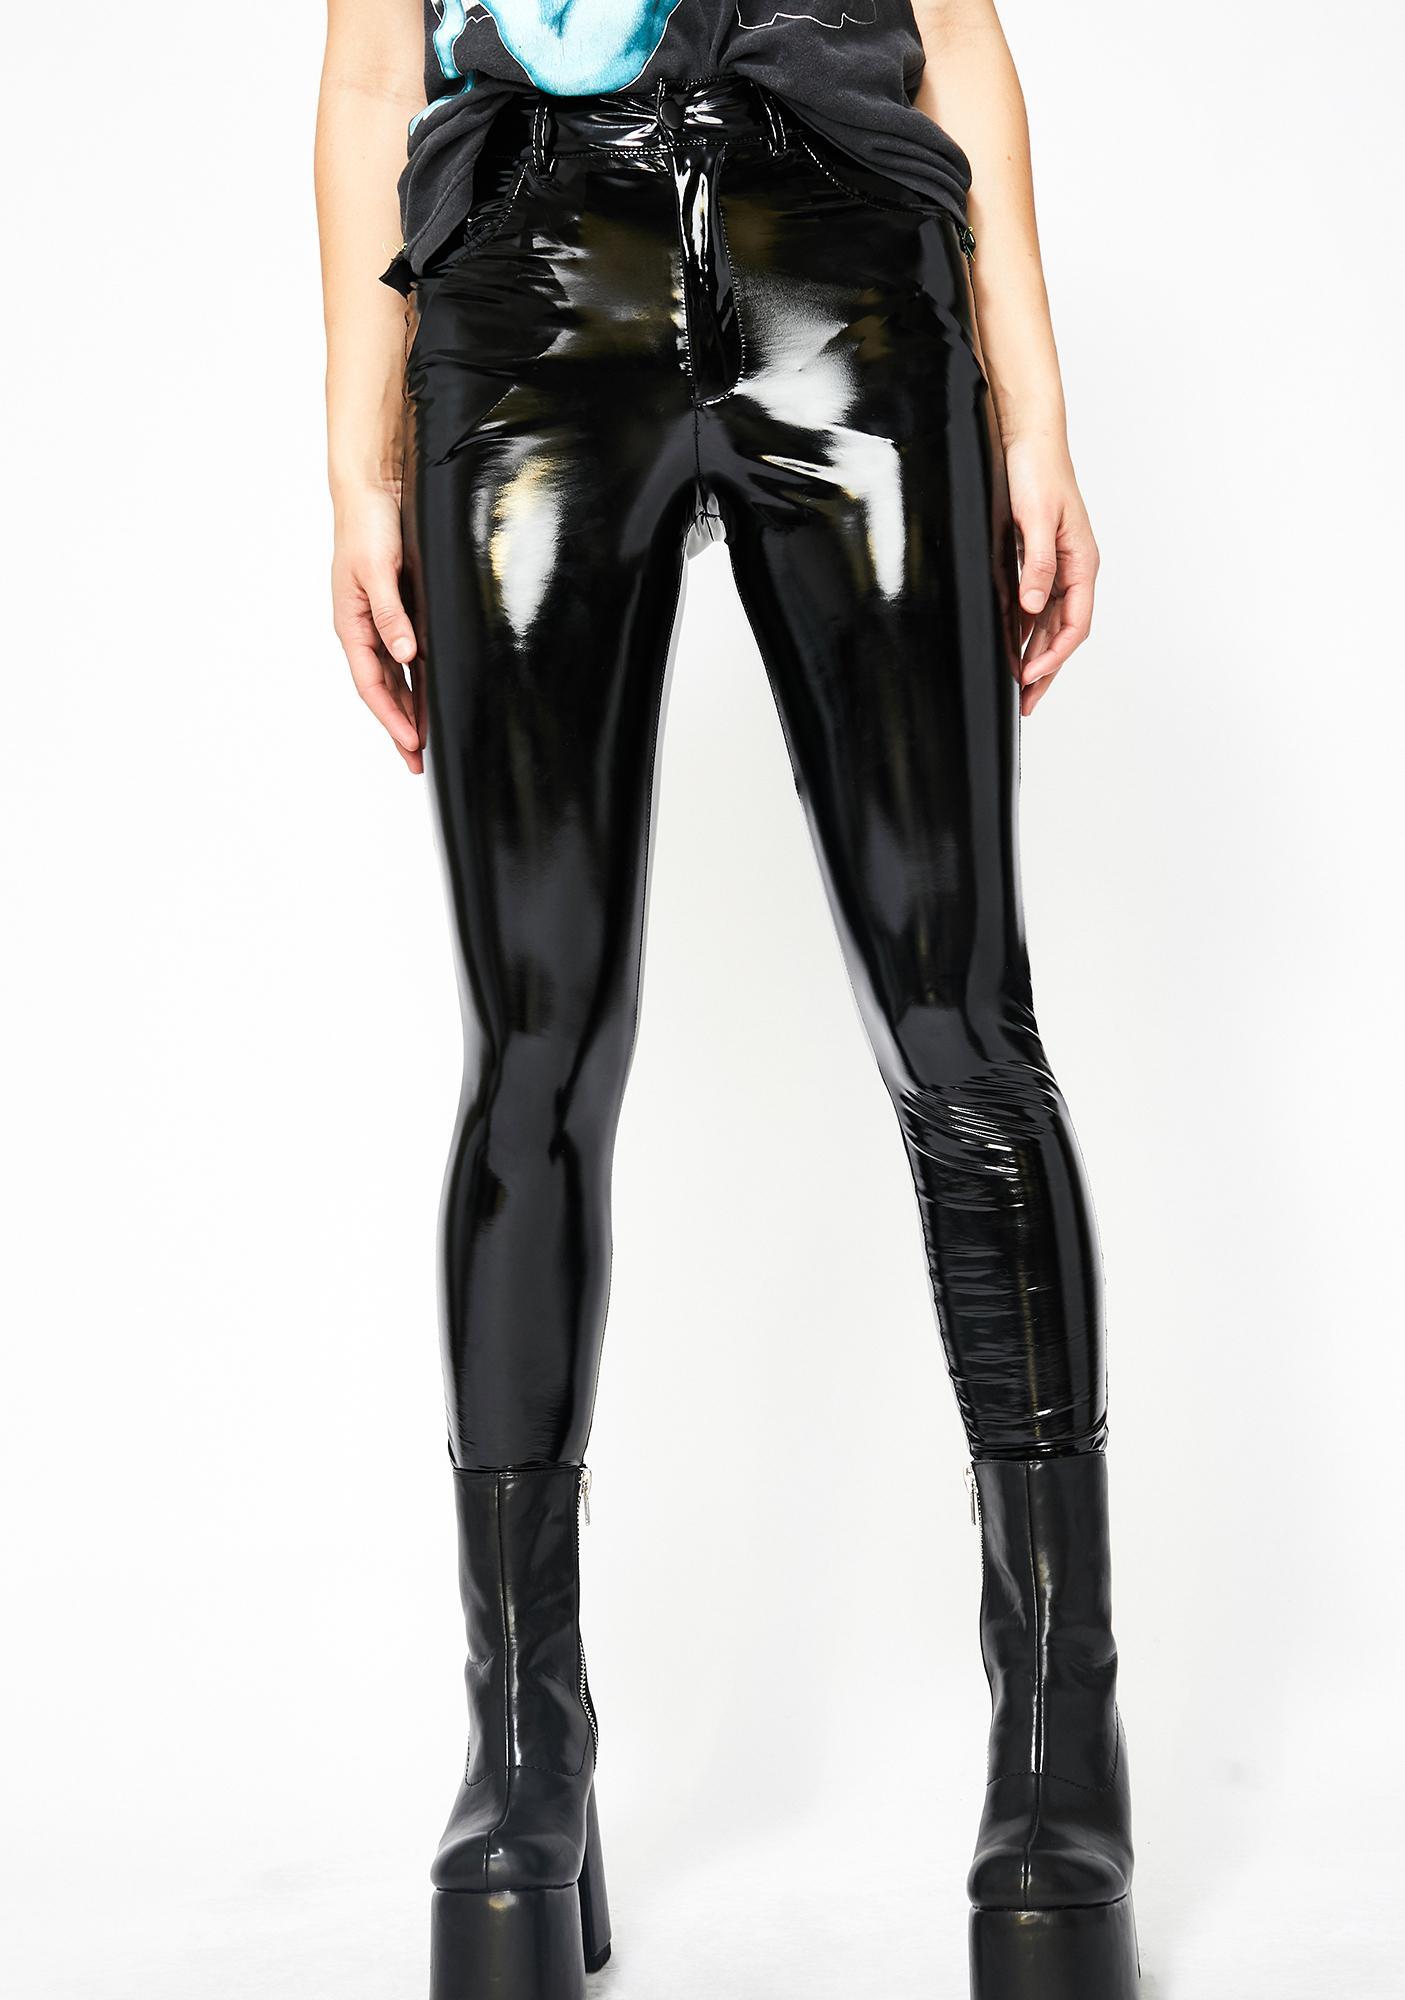 Dark Legally Flawless Vinyl Pants